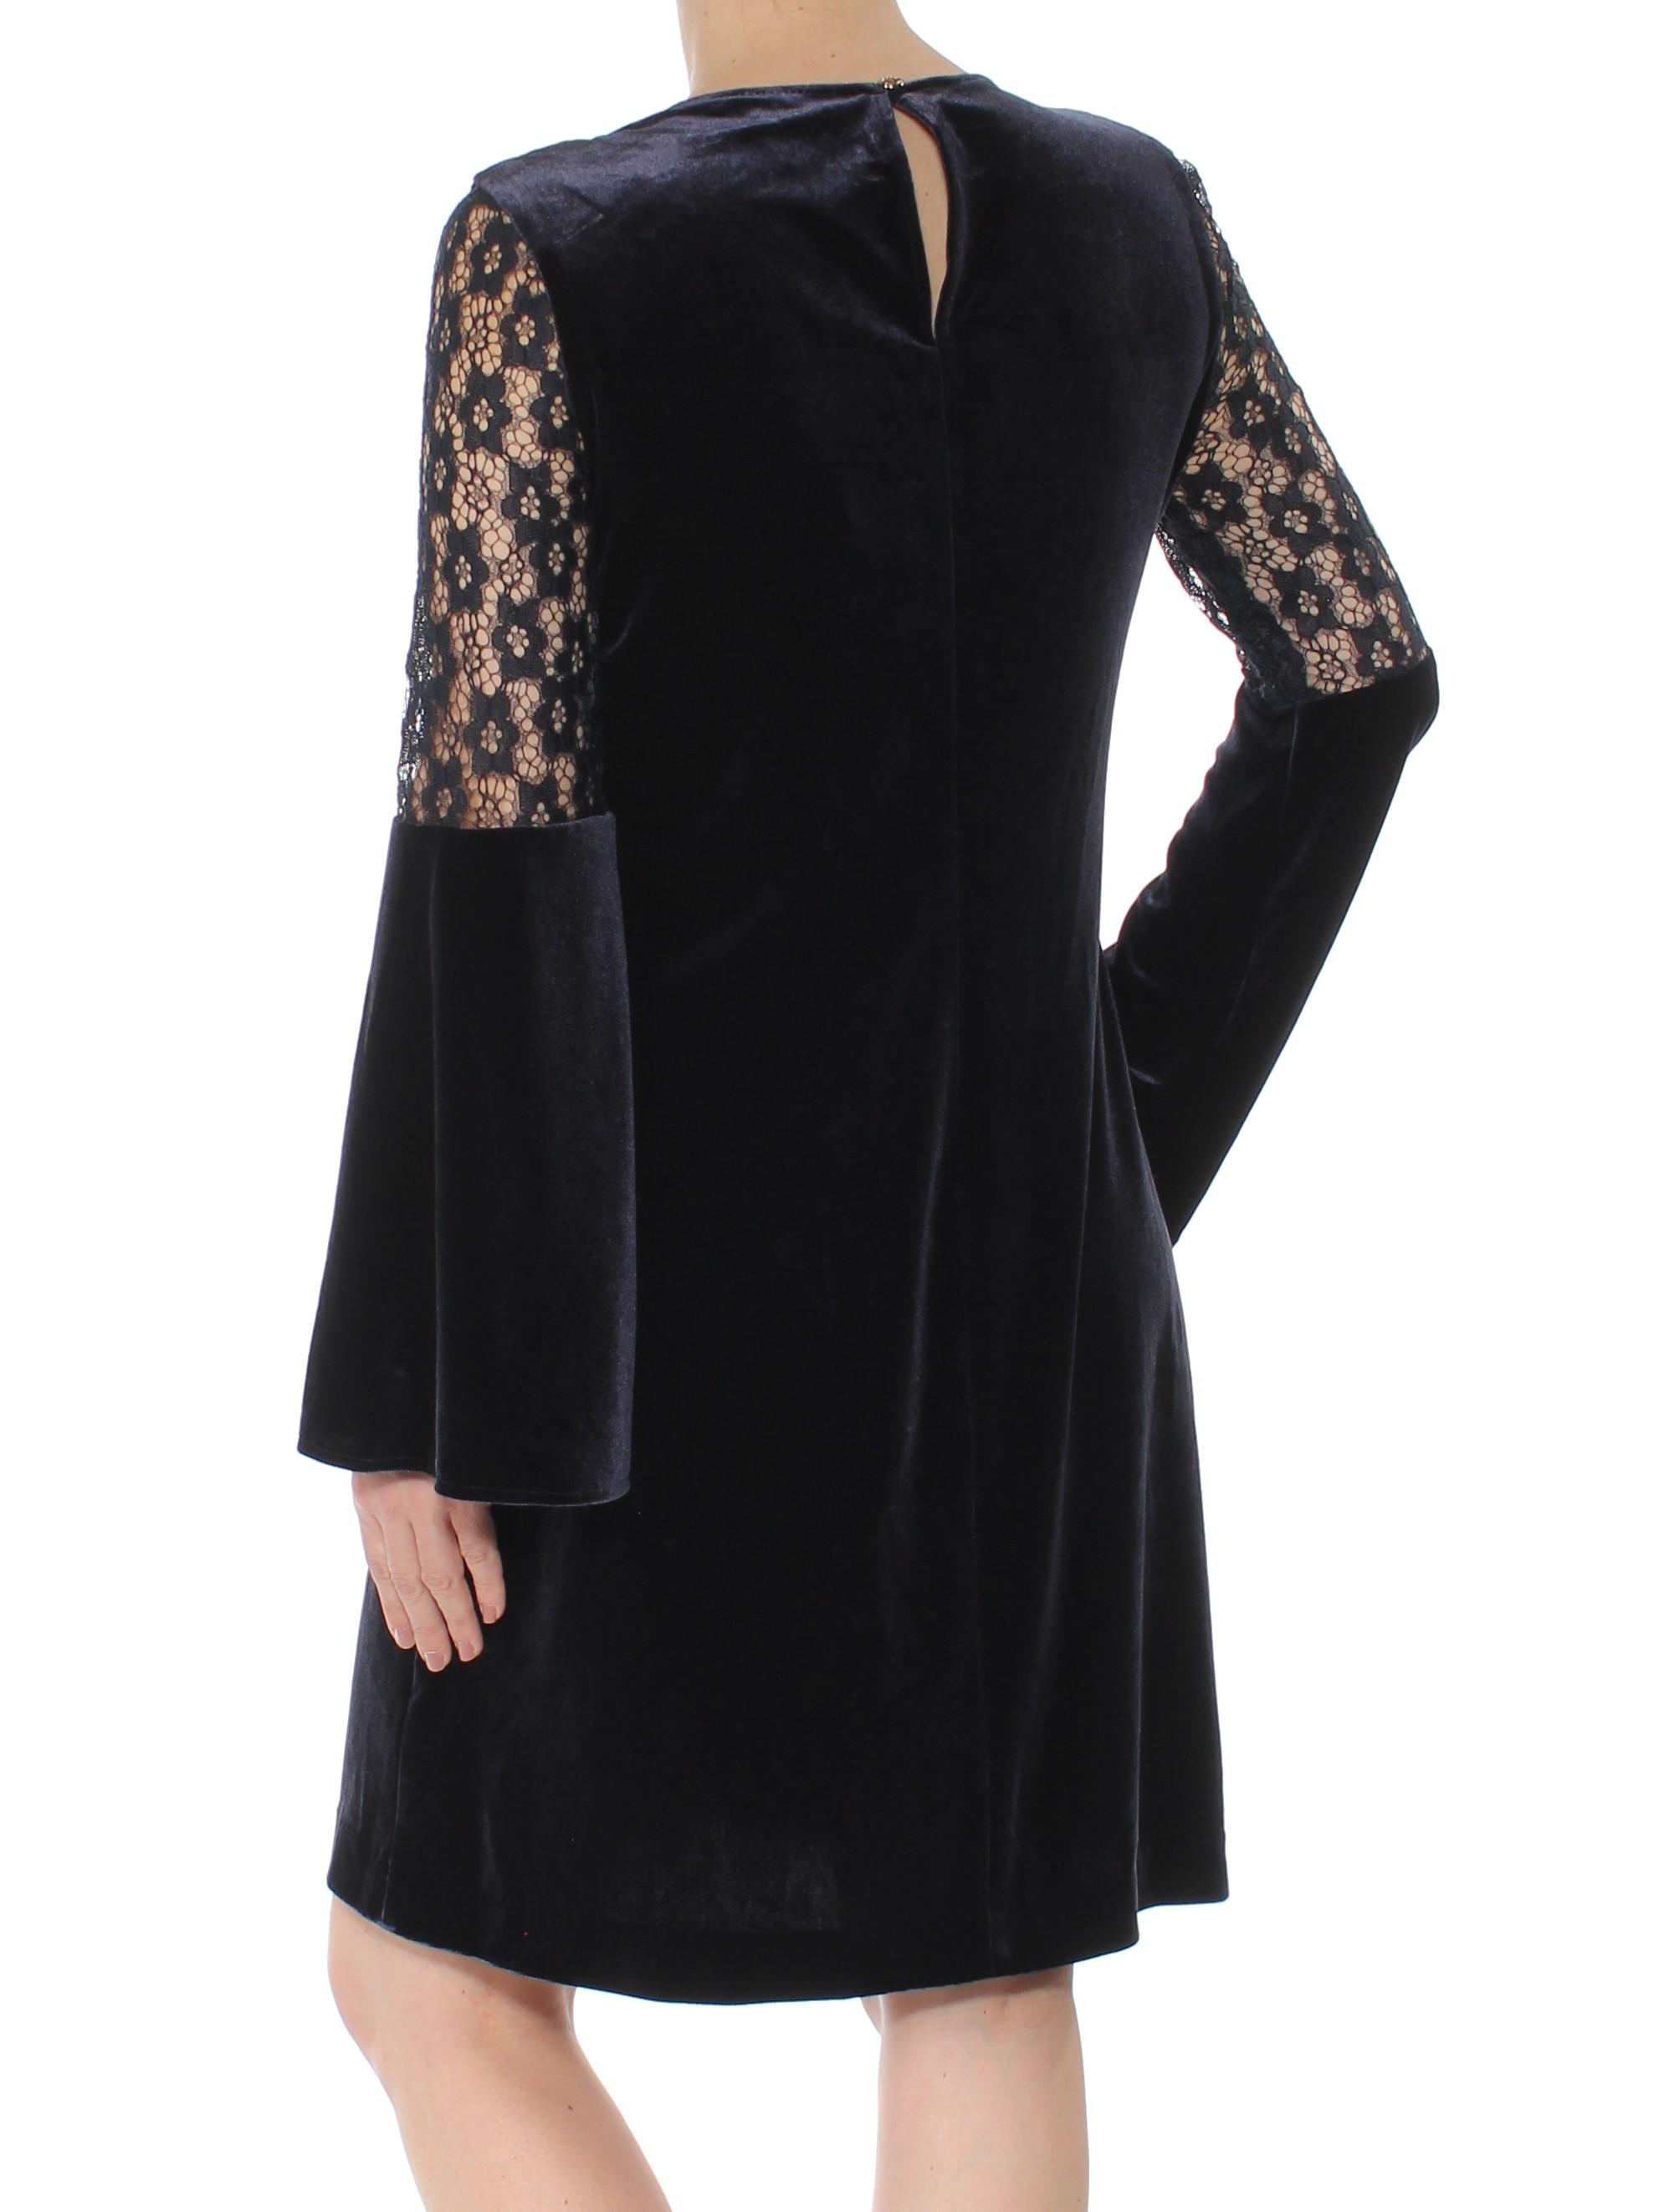 0a3915aee9d TOMMY HILFIGER $129 Womens New 1197 Navy Velvet Crochet Lace Shift Dress 2  B+B. gallery image gallery image. TOMMY HILFIGER GUARANTEED AUTHENTIC!